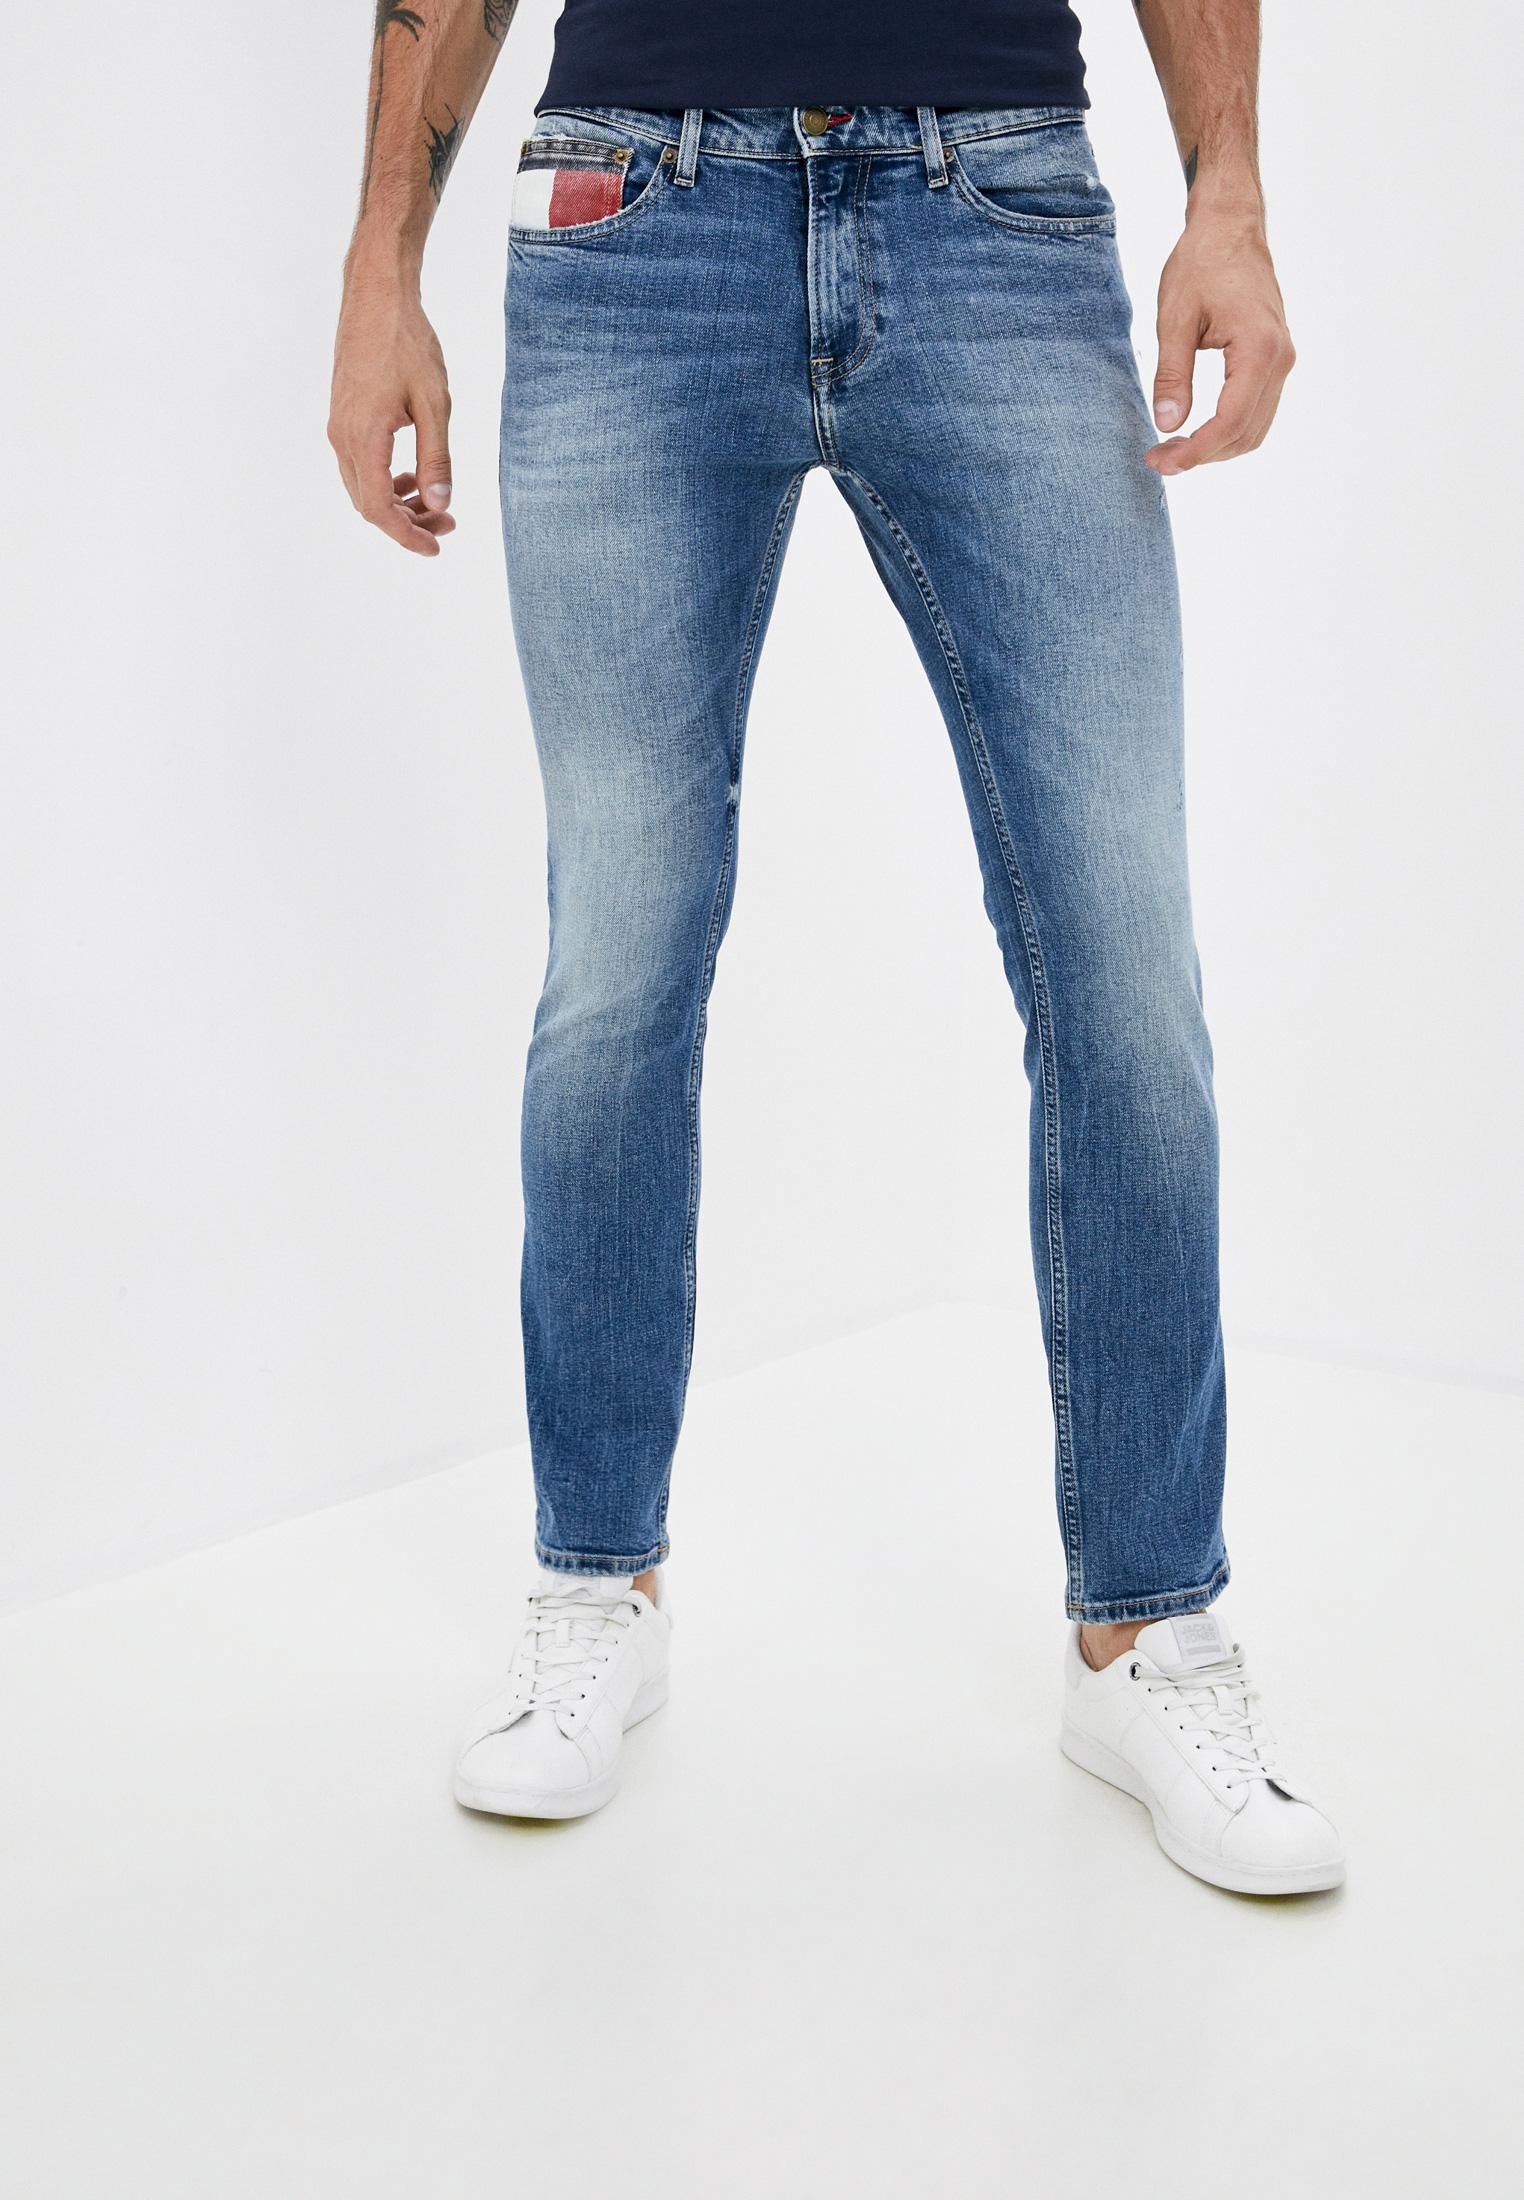 Джинсы Tommy Jeans Scanton за 11 690 ₽. в интернет-магазине Lamoda.ru